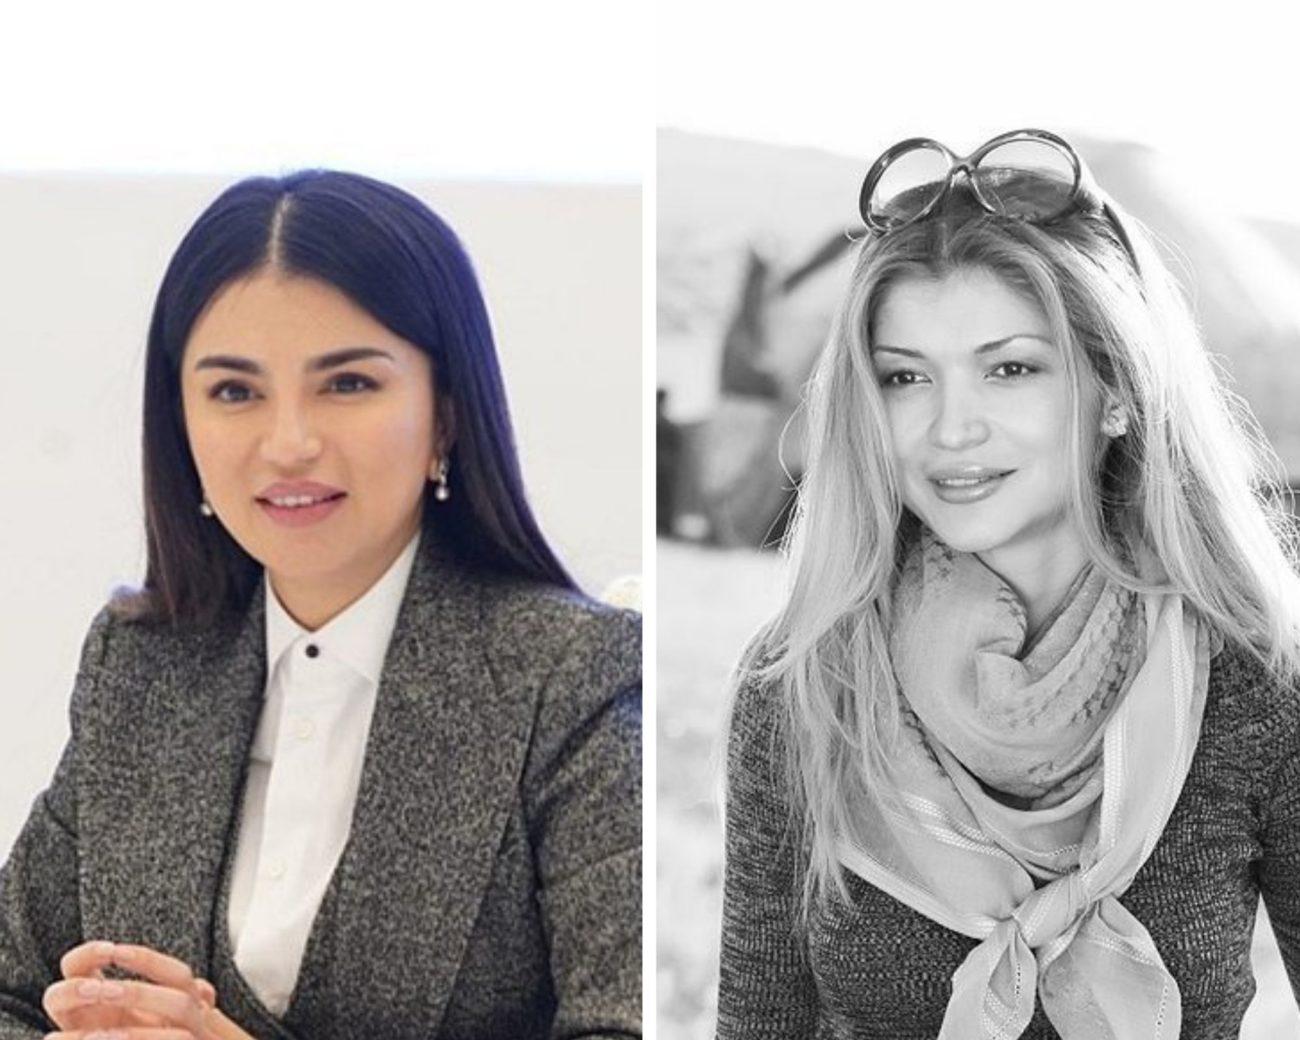 Goulnara Karimova Saïda Mirzioïeva Politique Ouzbékistan